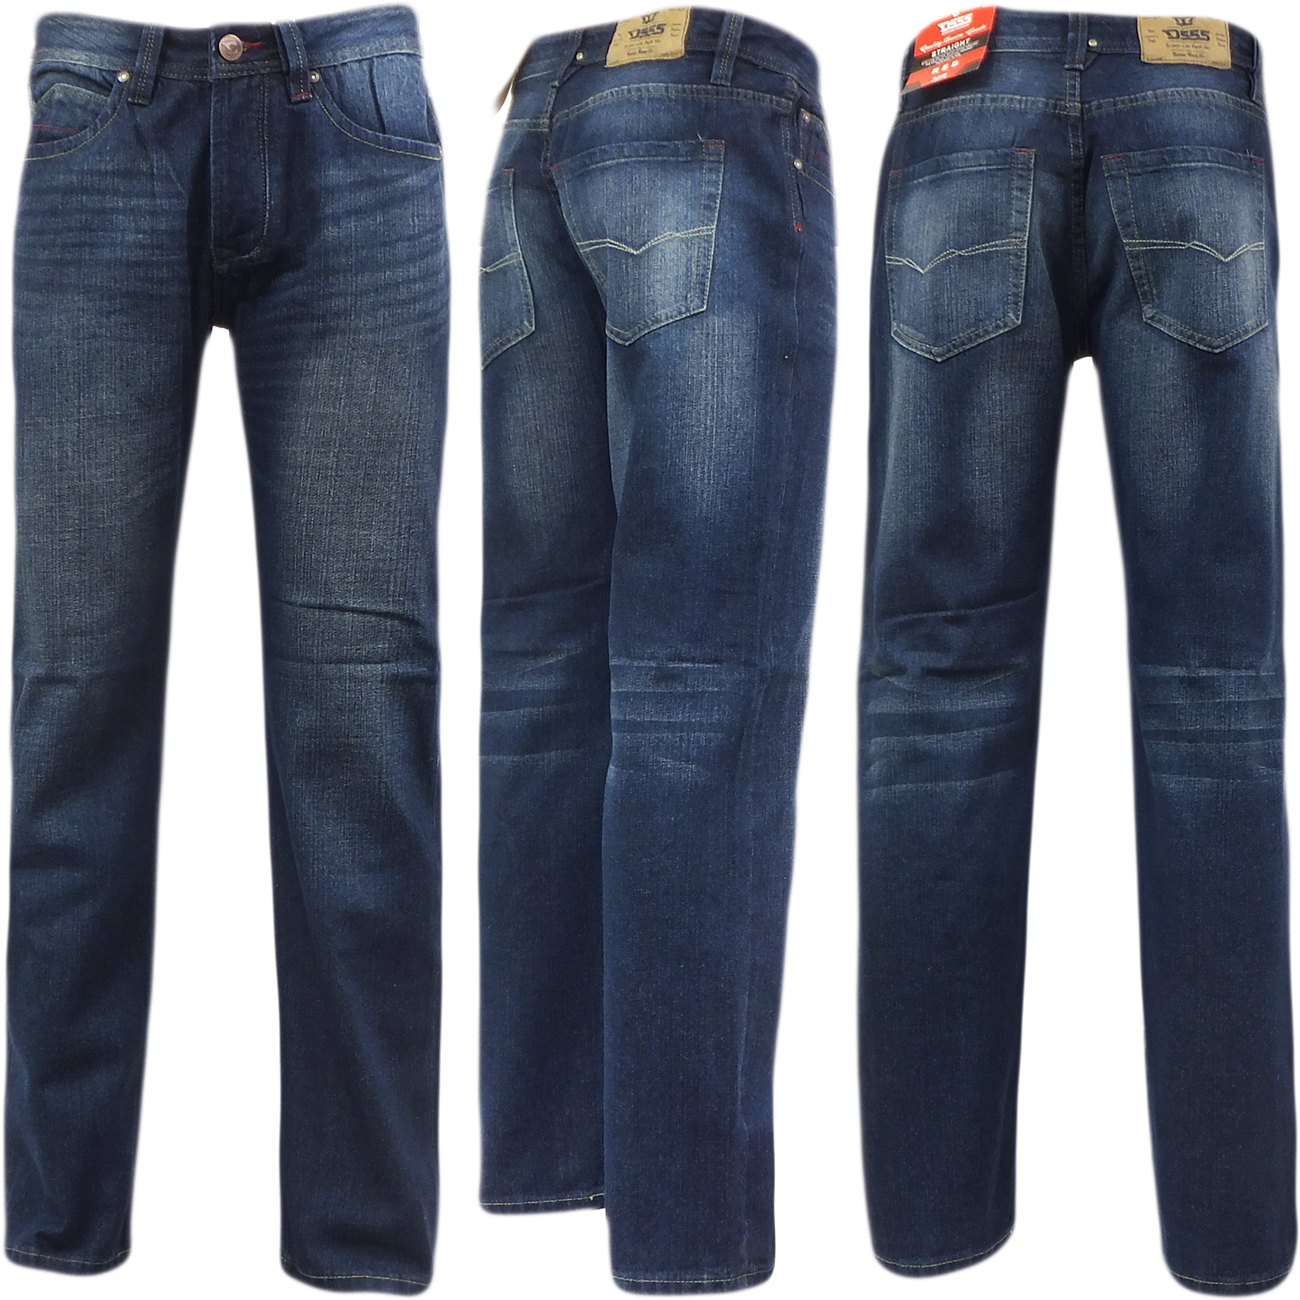 D555 Mens Straight Jean Relaxed Fit Denim Trouser Pant 'Rinaldo' Vintage Indigo